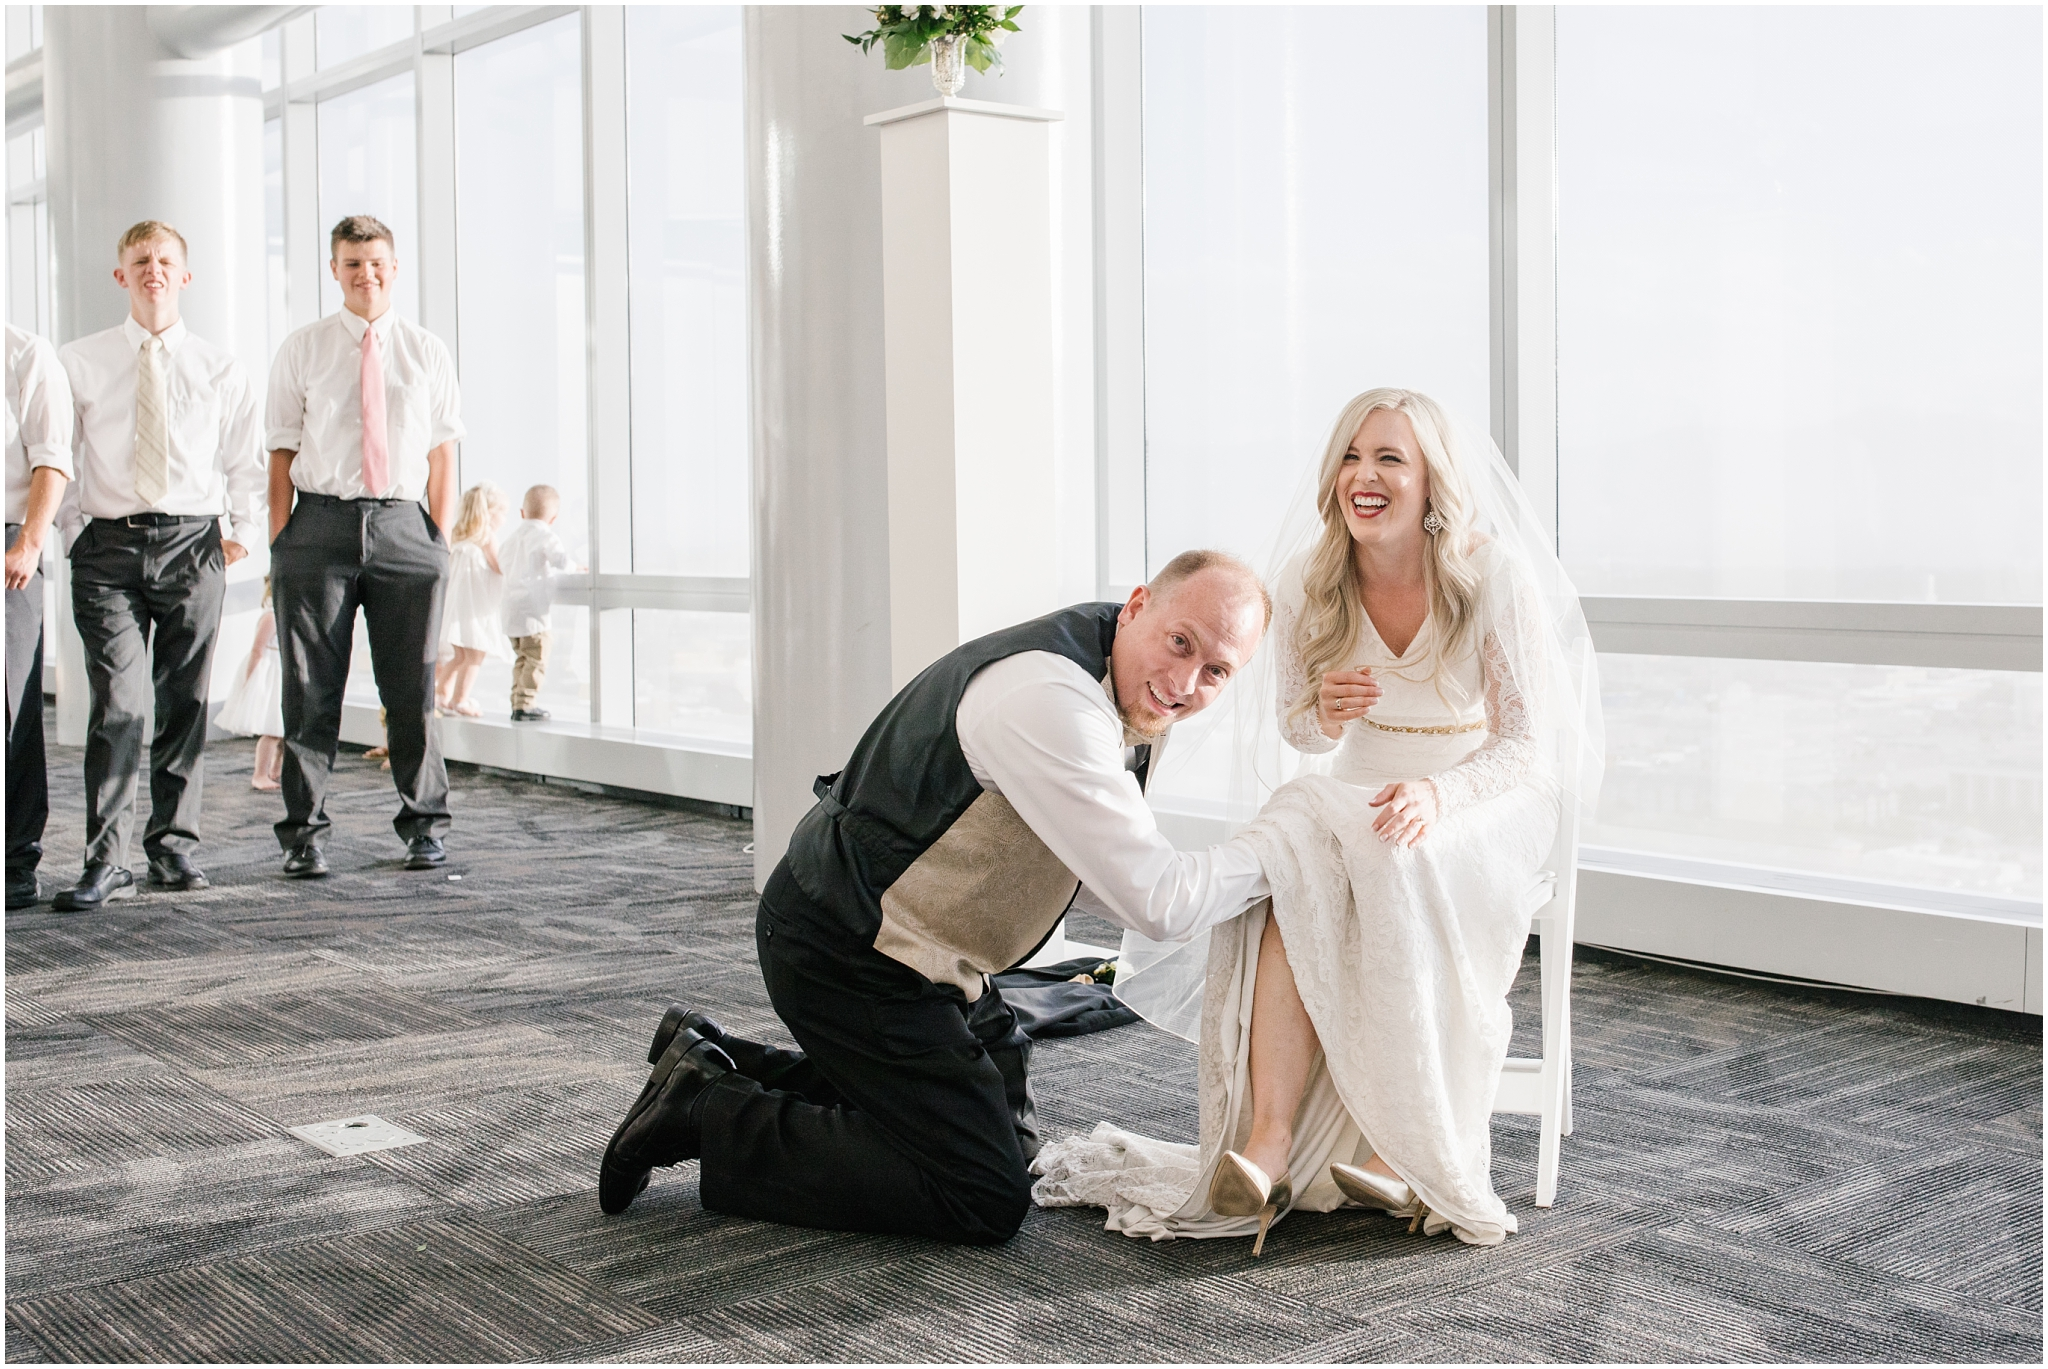 CherylandTyler-532_Lizzie-B-Imagery-Utah-Wedding-Photographer-Salt-Lake-City-Temple-Wells-Fargo-Building-Reception.jpg